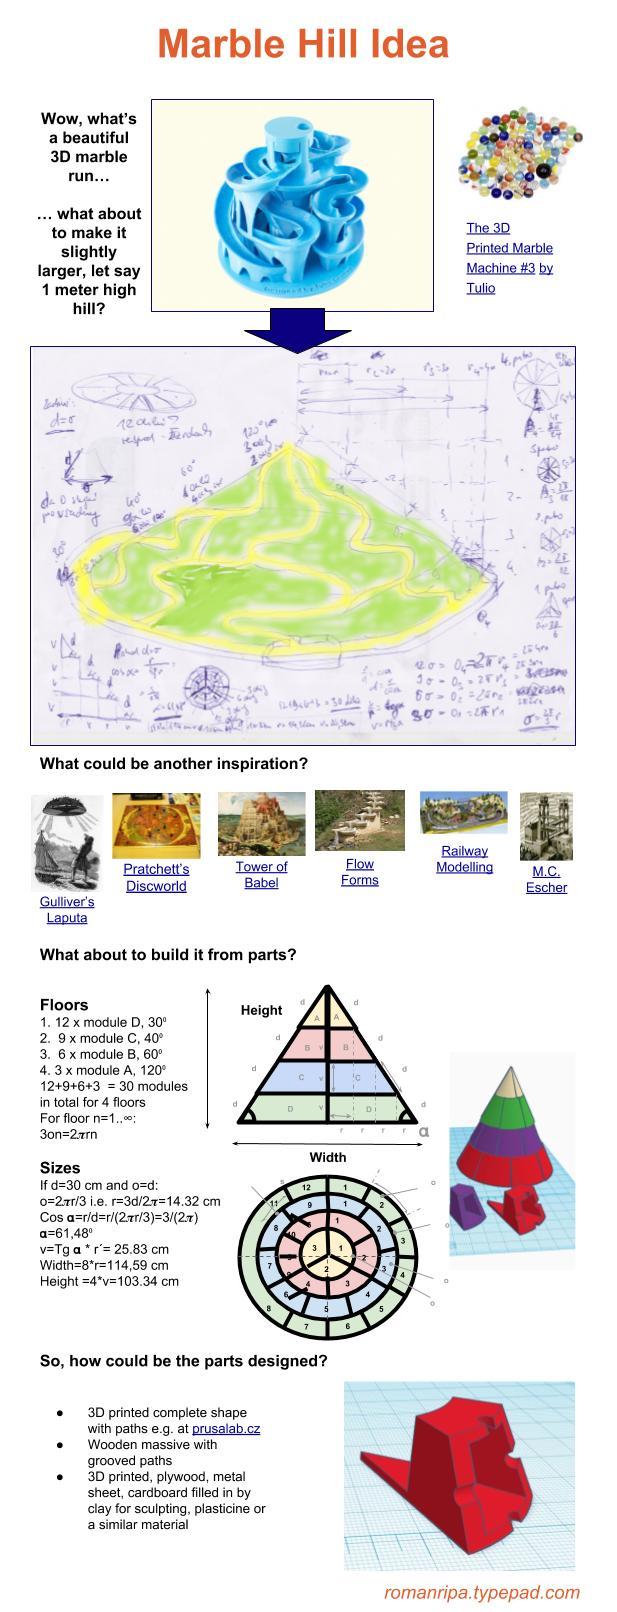 Marble Hill - Idea